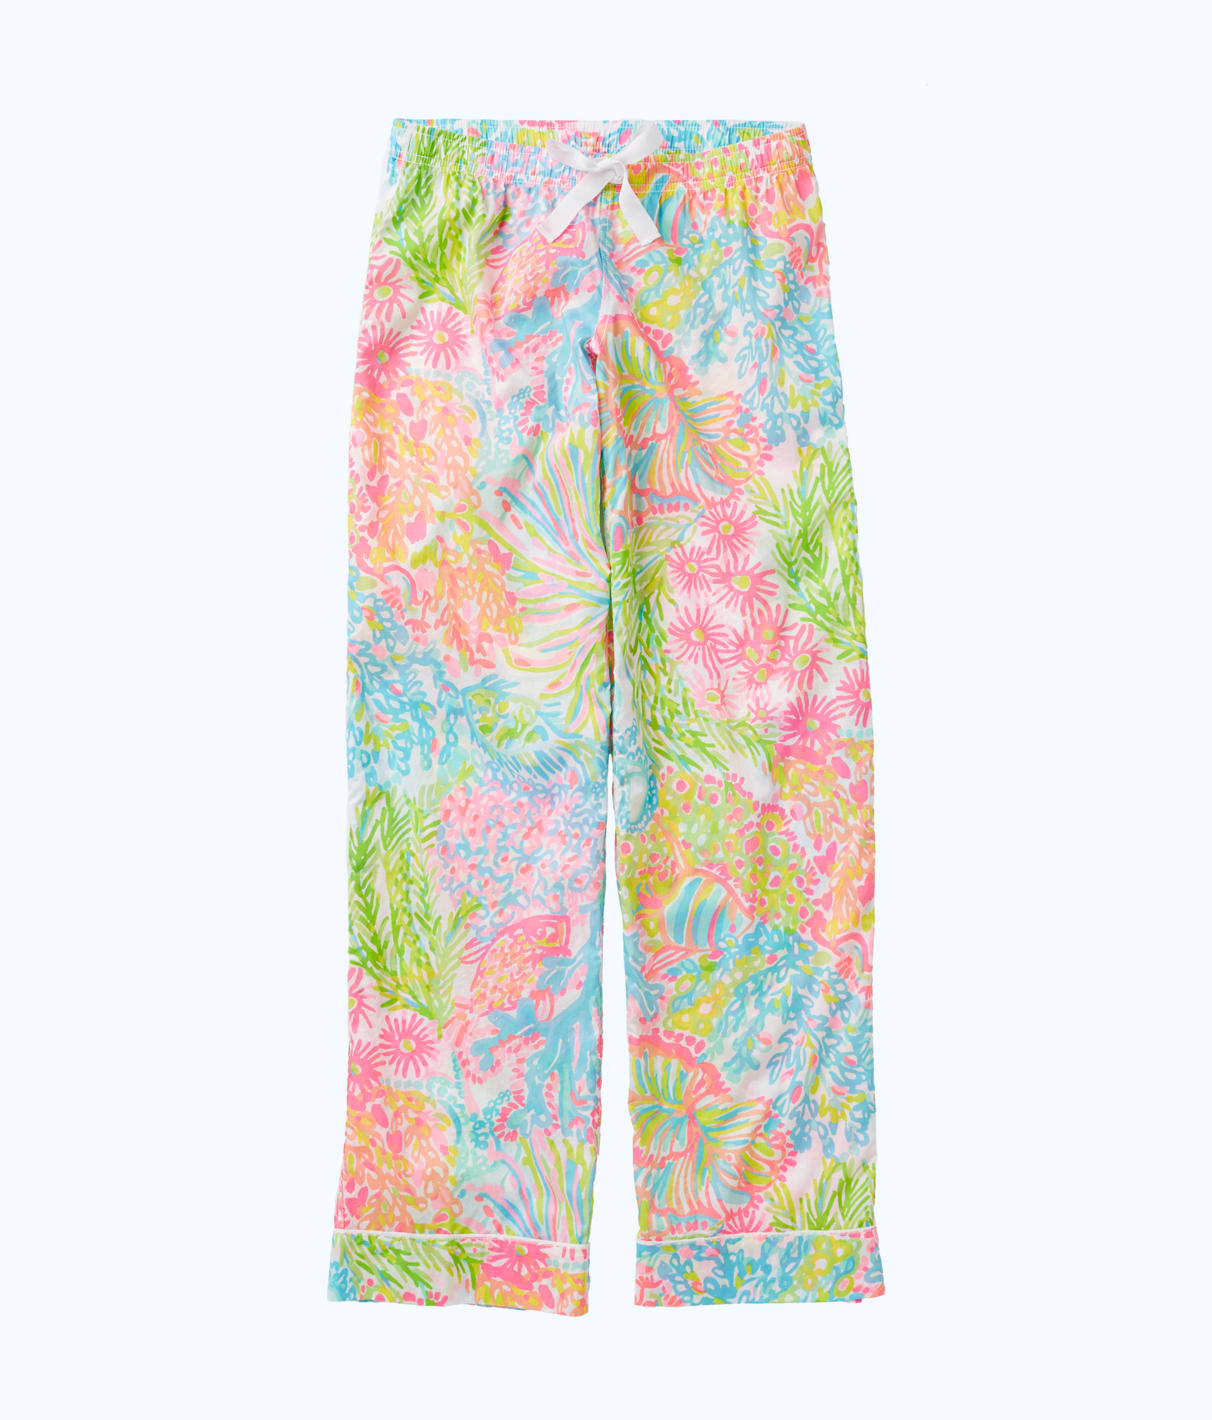 Lilly Pulitzer Printed Pajama Pant